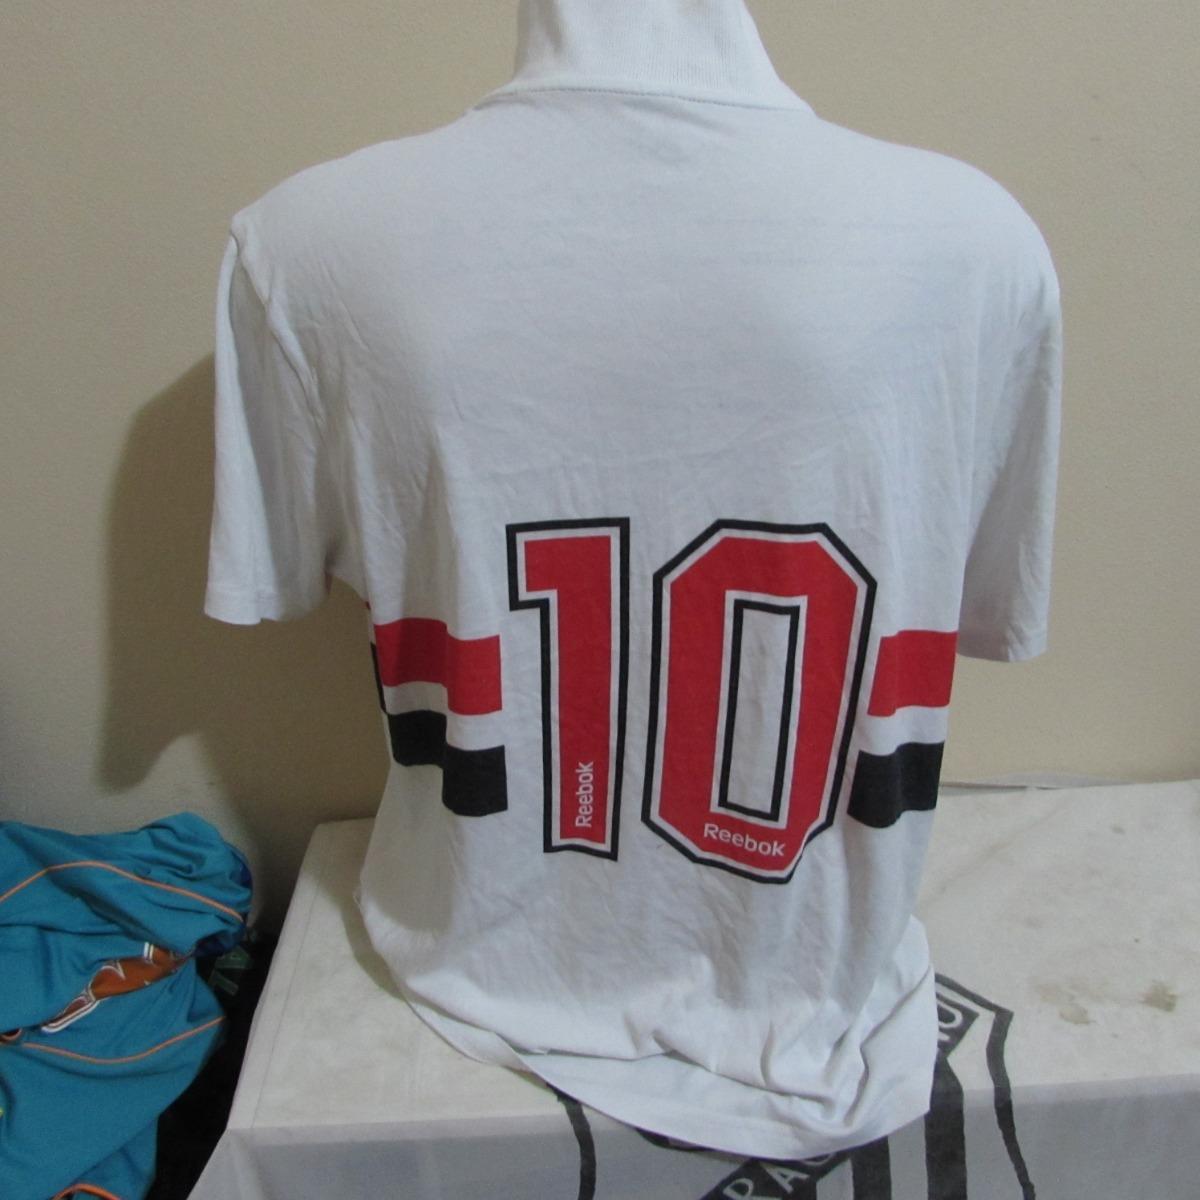 Camisa Do Sao Paulo Comemorativa Do Rai - R  120 8ebf545cdea81